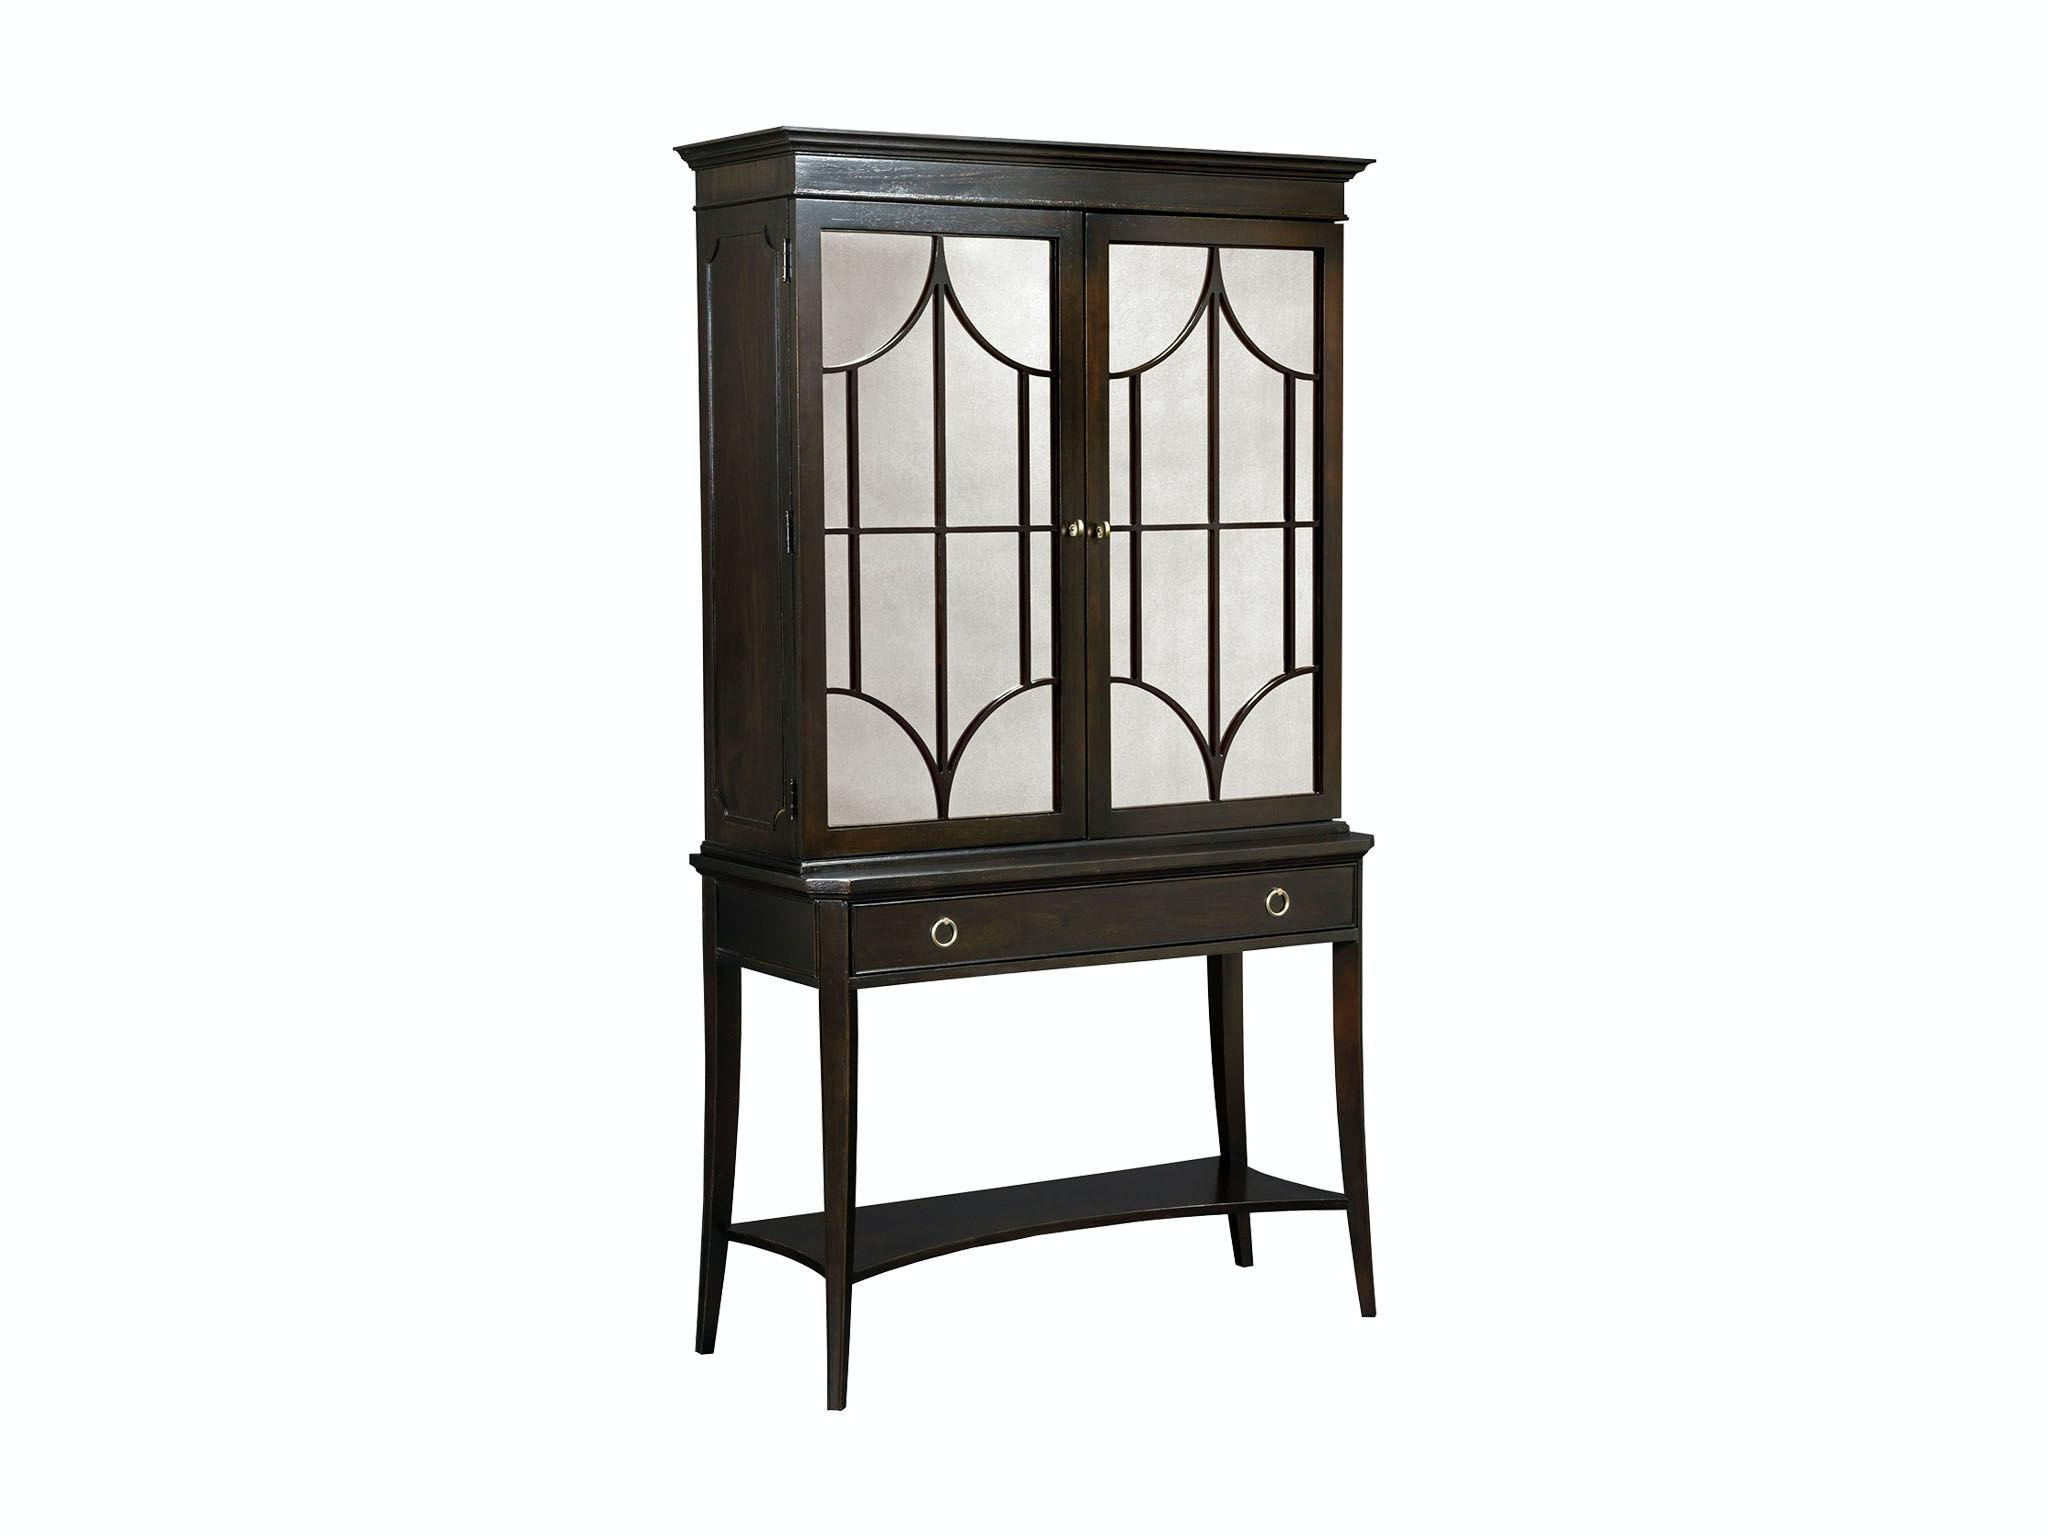 Drexel Heritage Home Office Regent Secretary Base 550-901 - Ennis Fine Furniture - Boise, ID ...